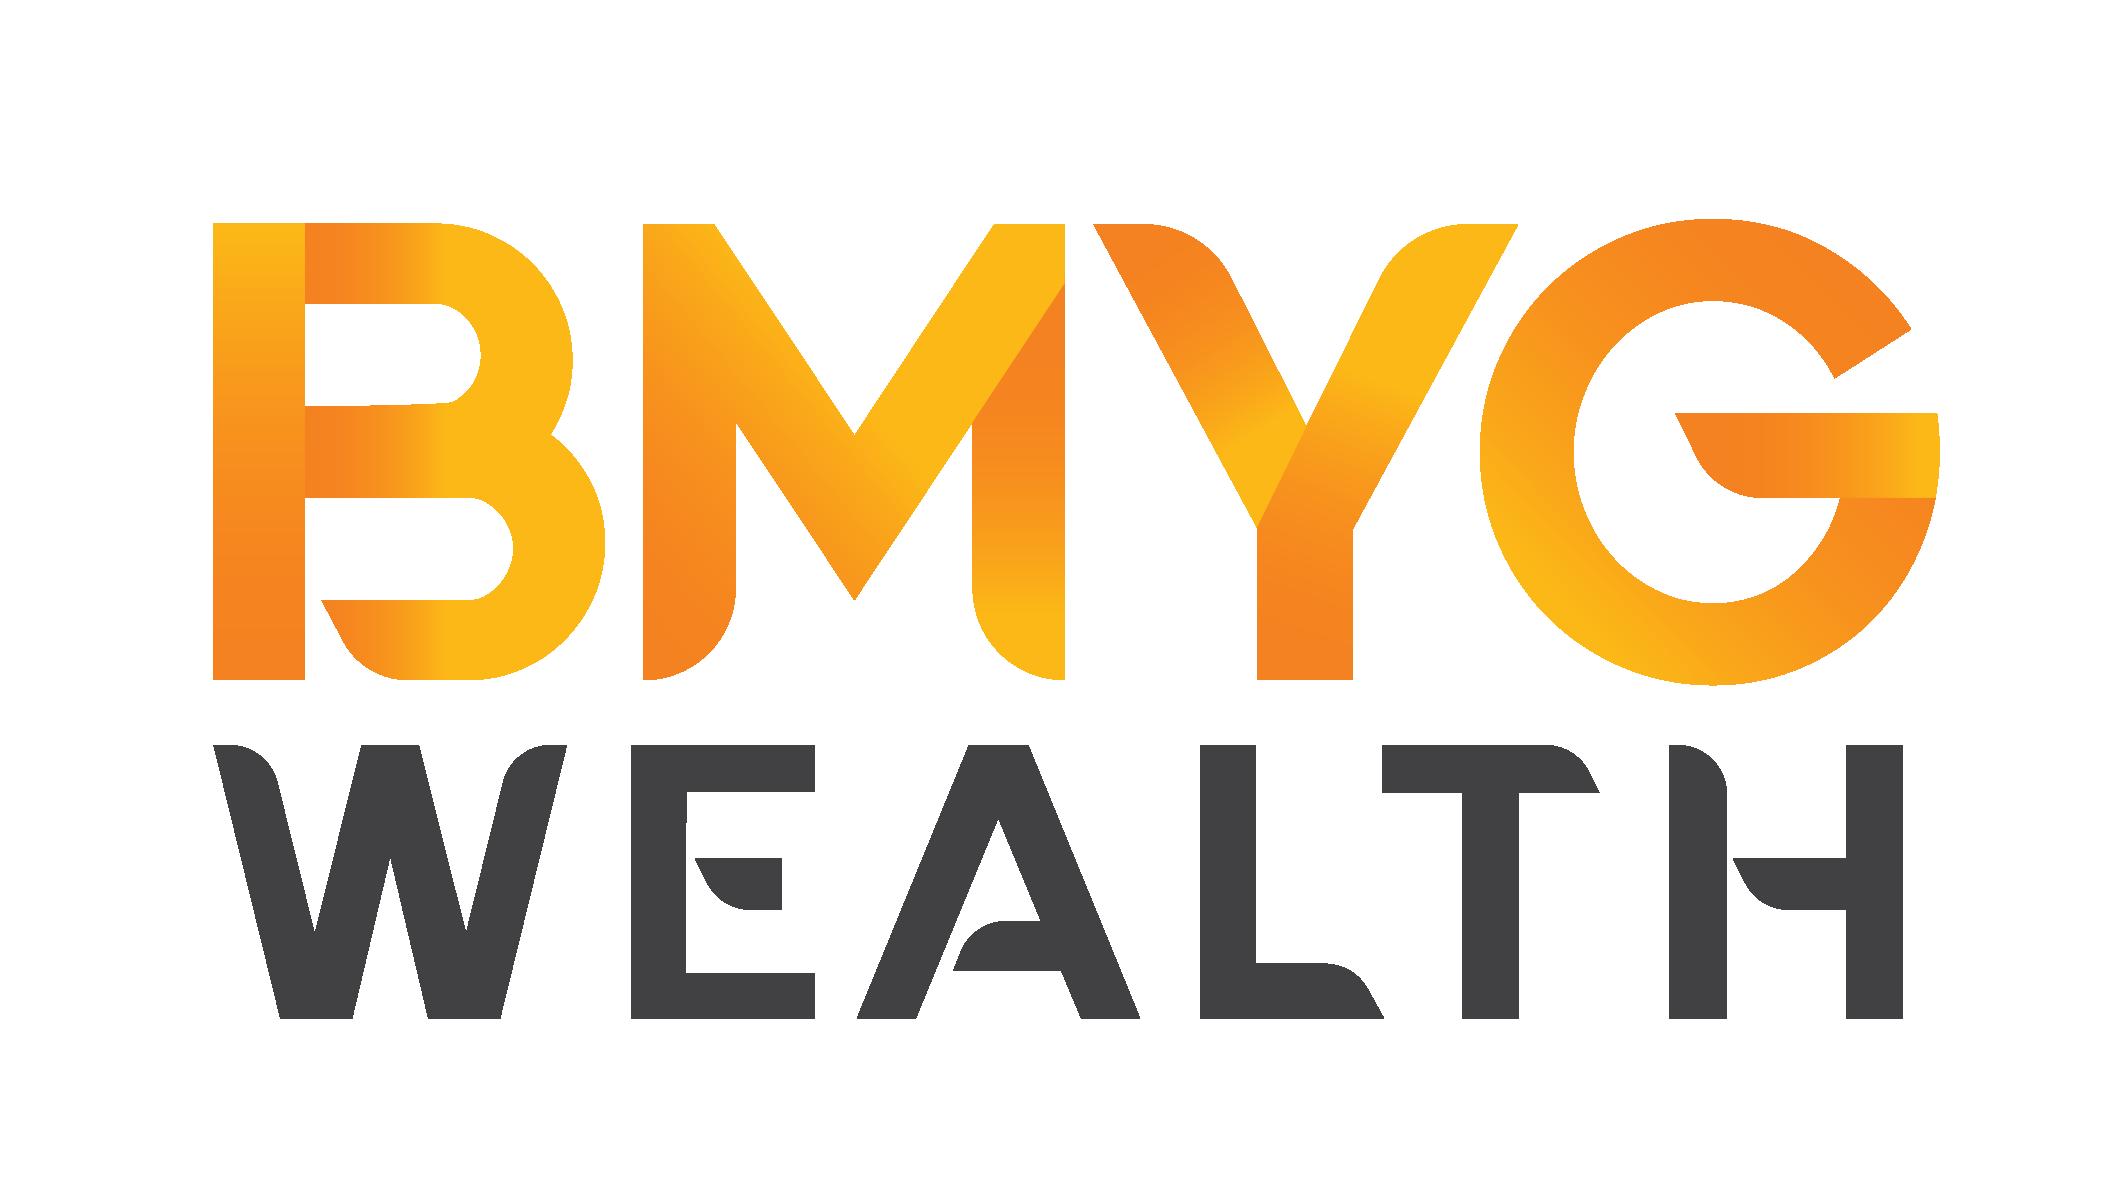 BMYG Wealth博满财富